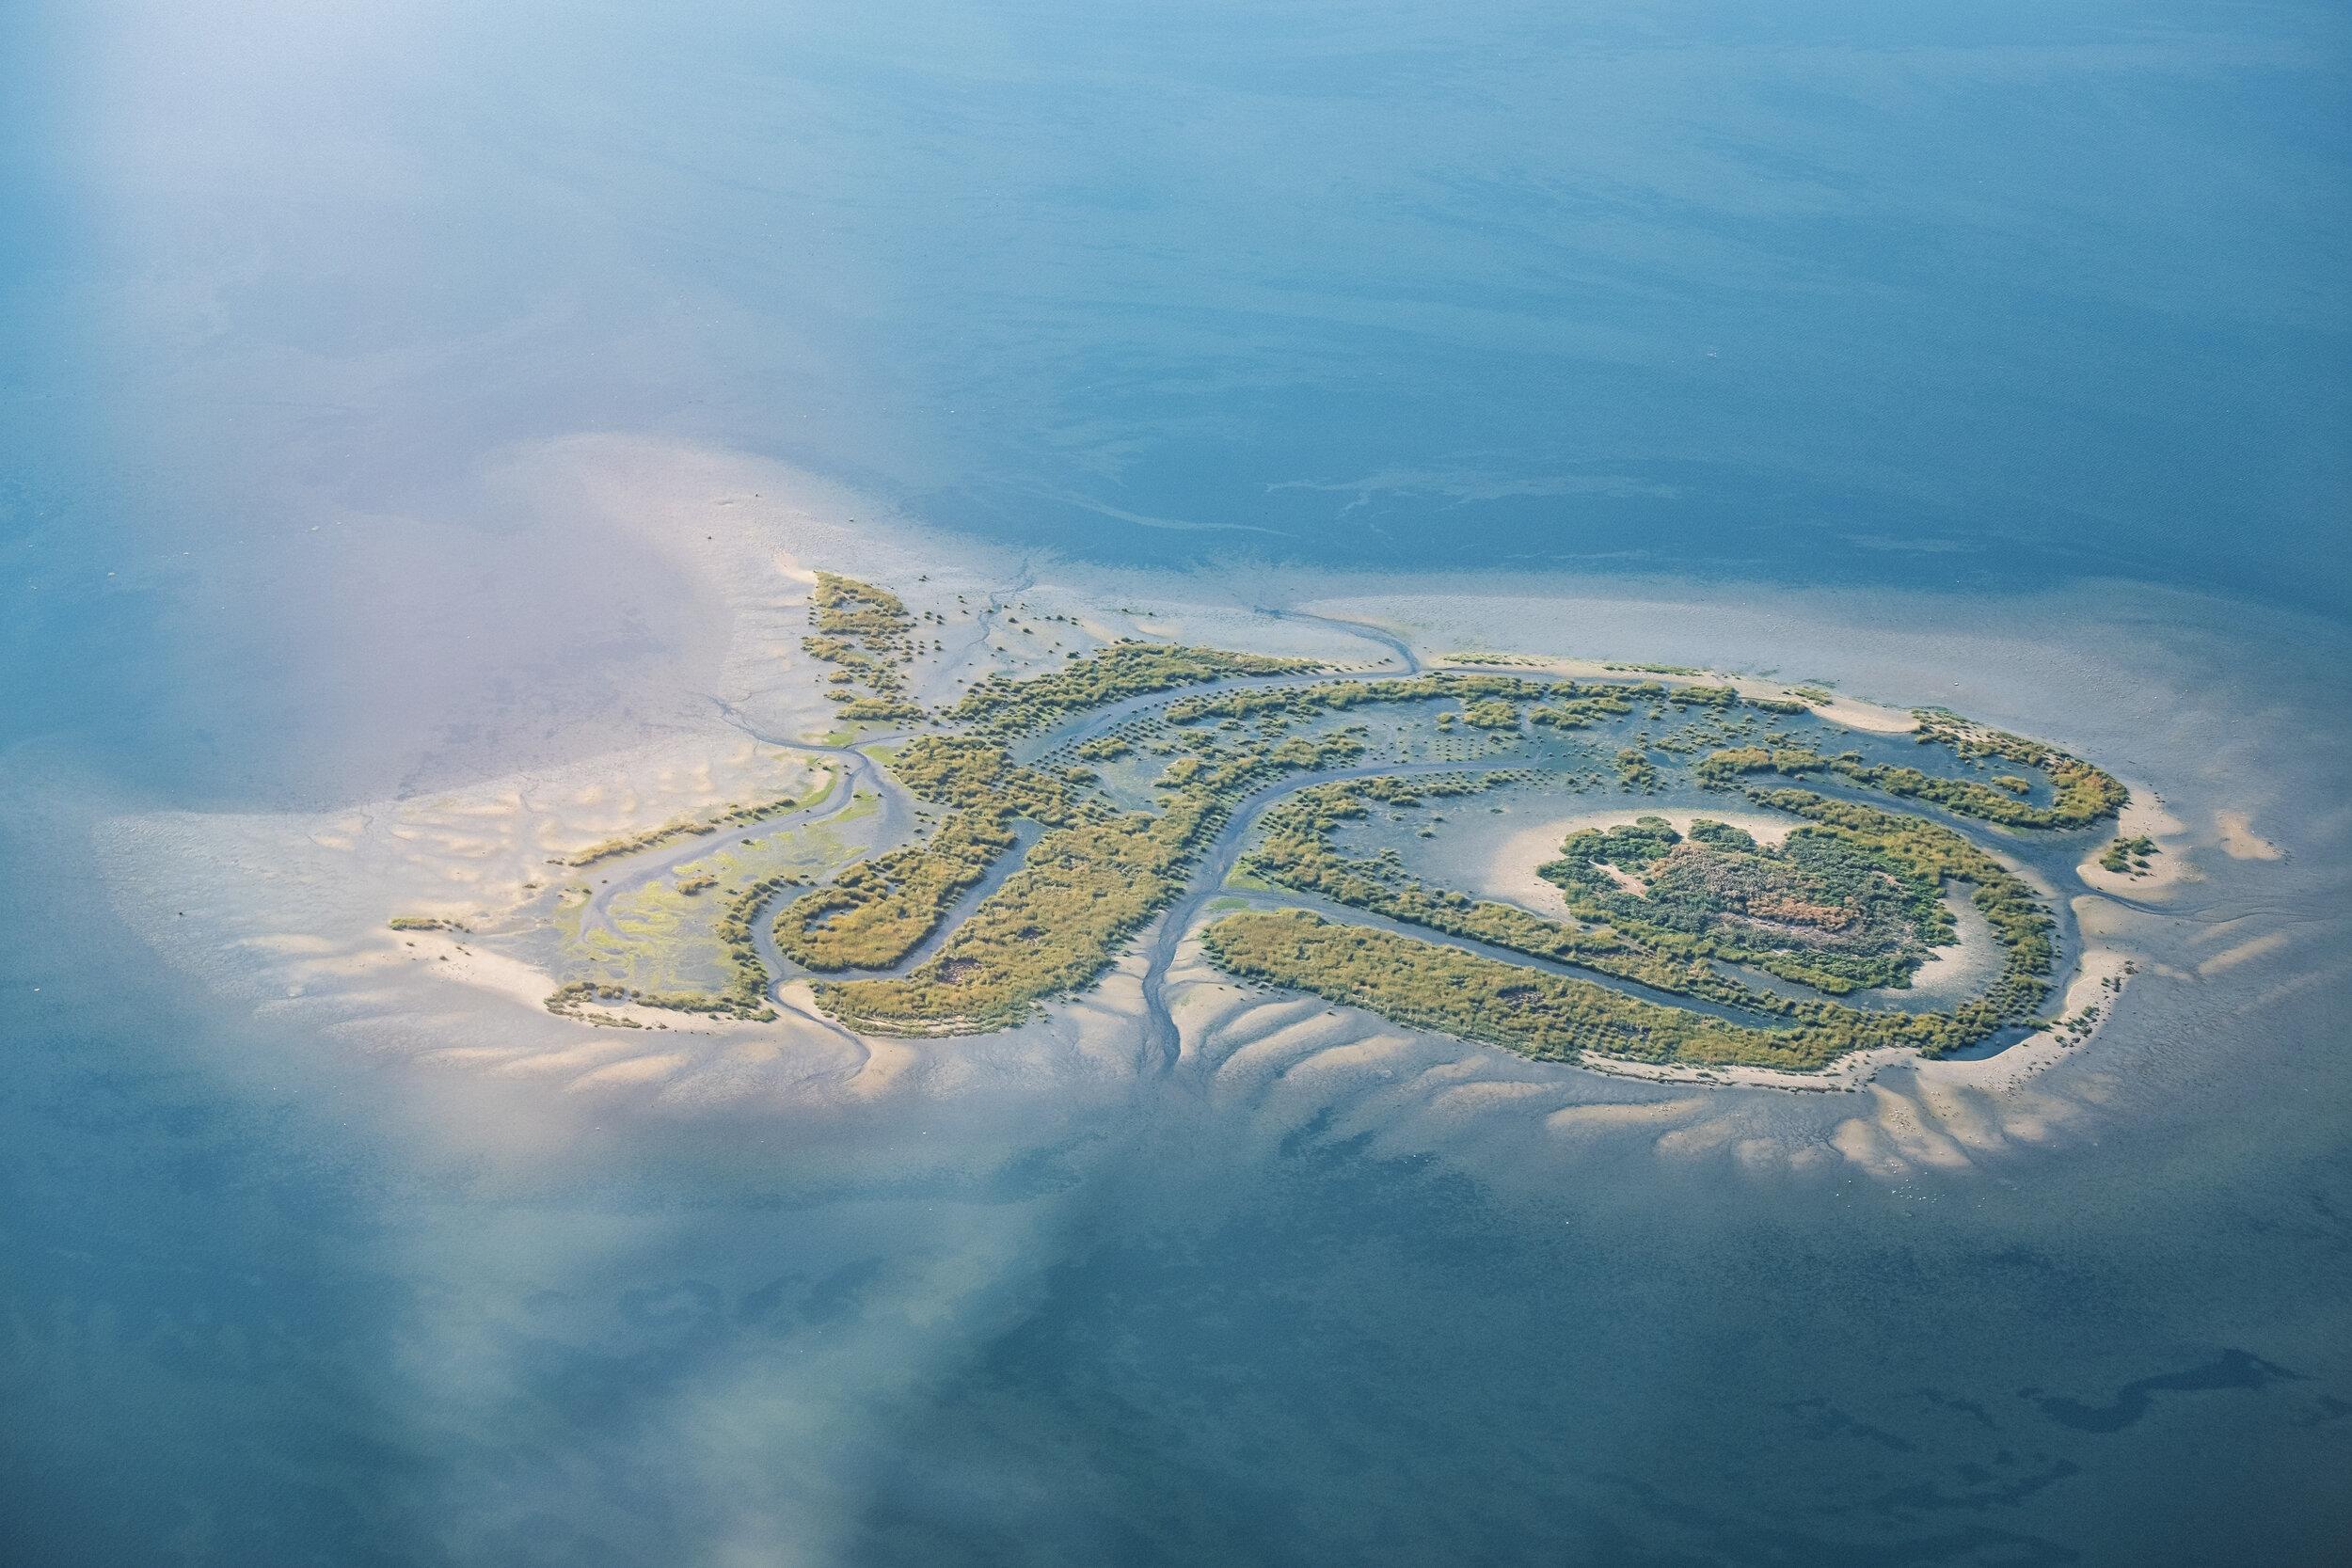 Jamaica Bay Lagoon